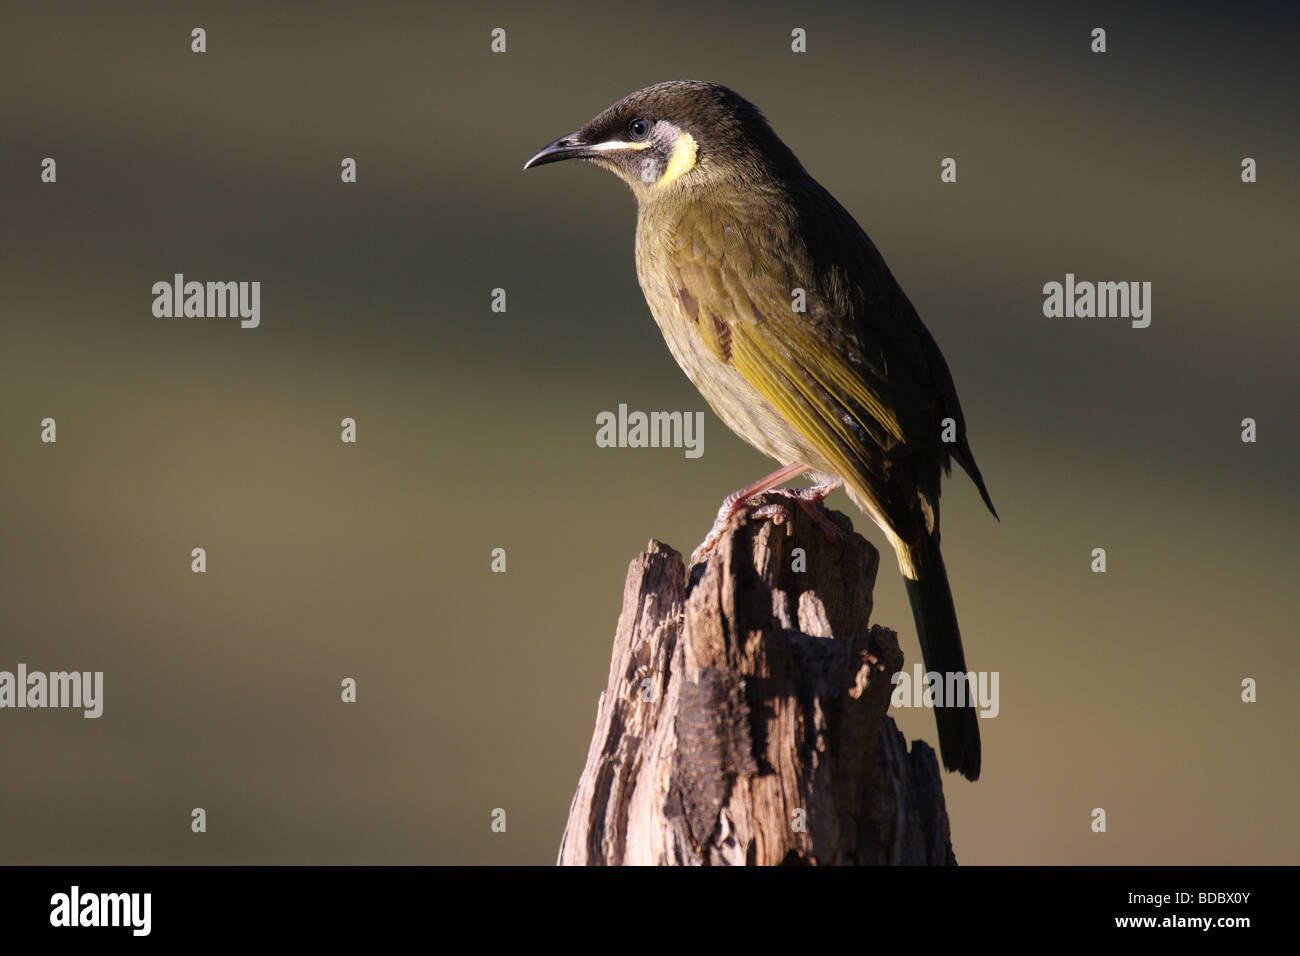 Lewin's honeyeater - Stock Image